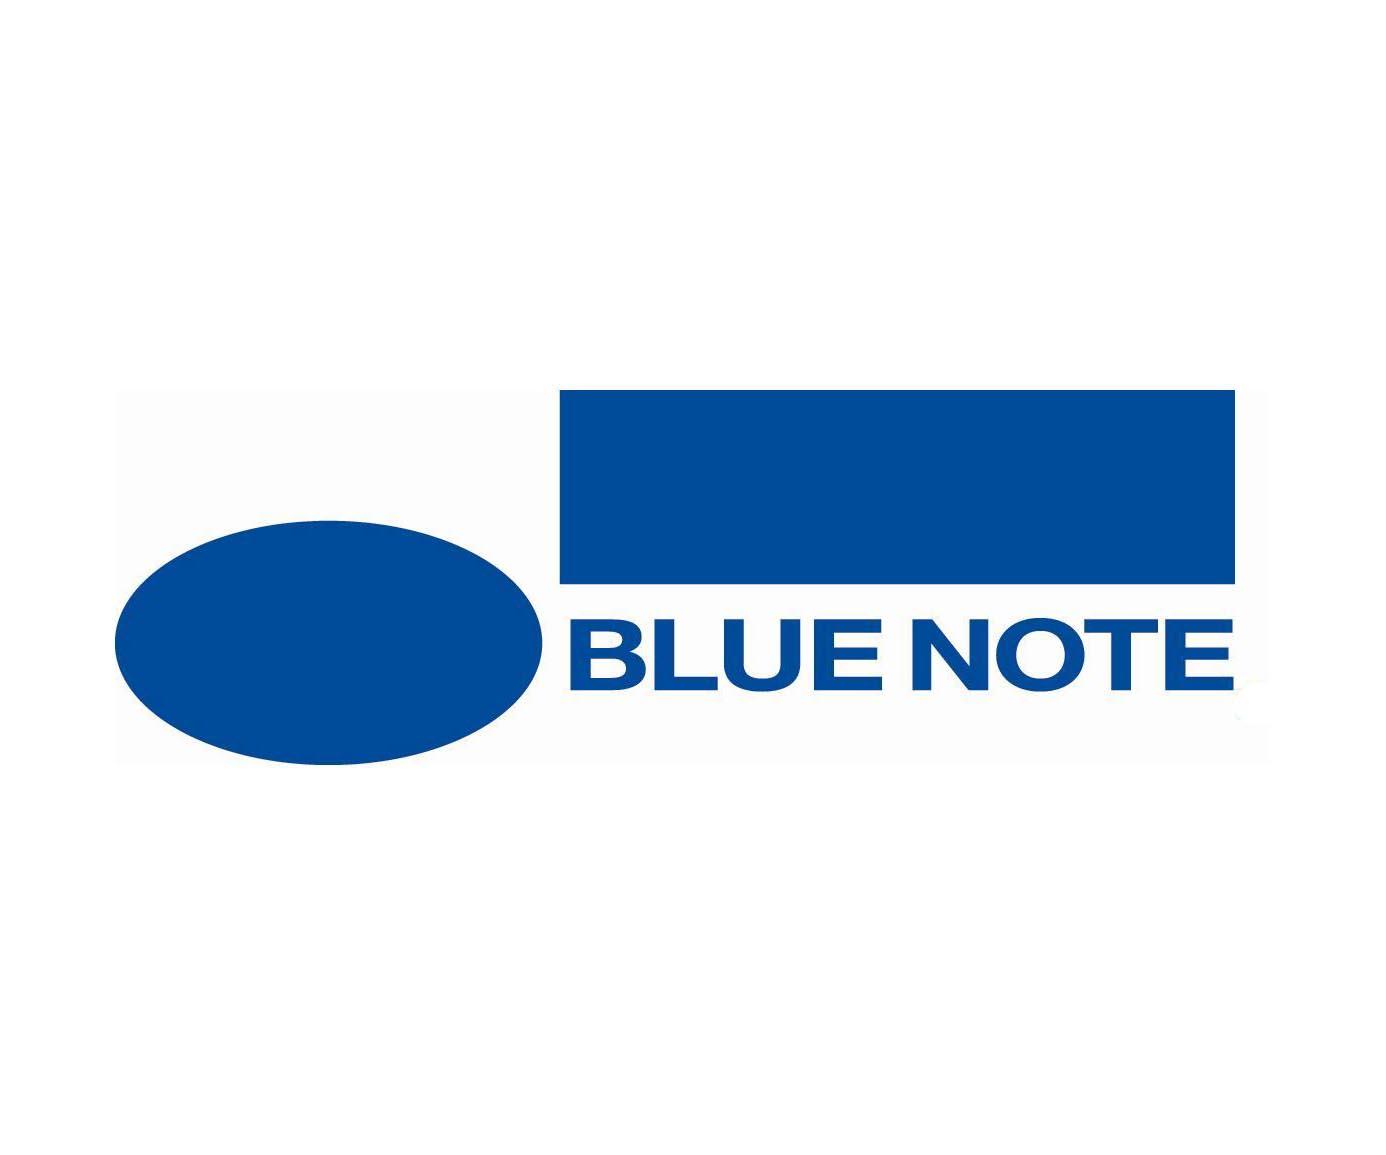 blue_note_logo.jpg